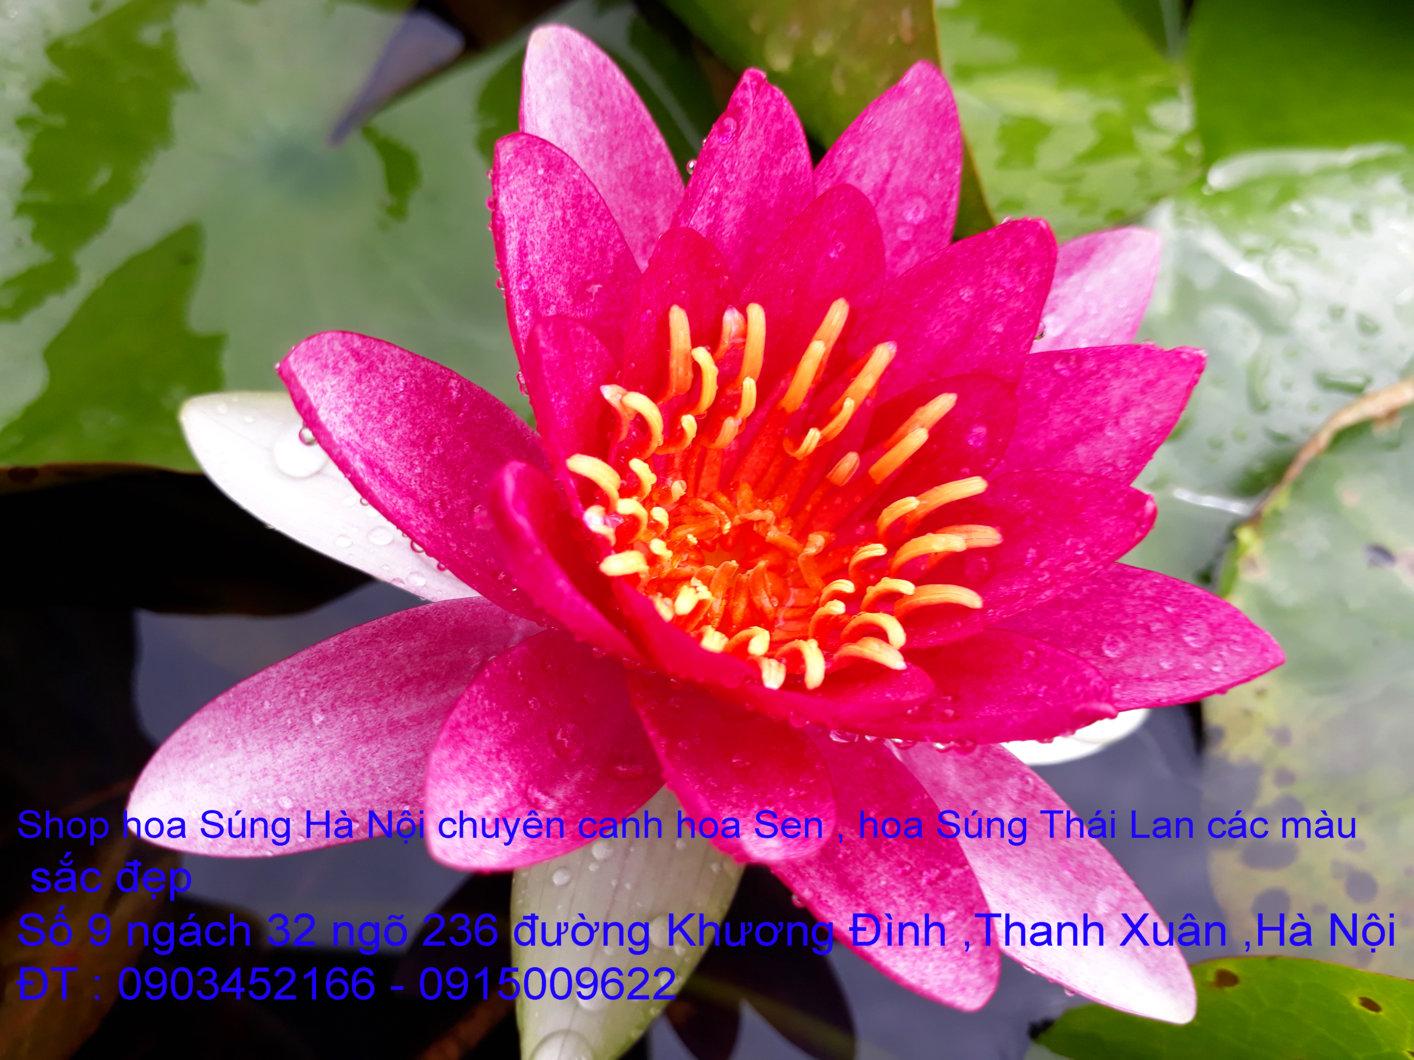 a1-sung-do-2-jpg.42171